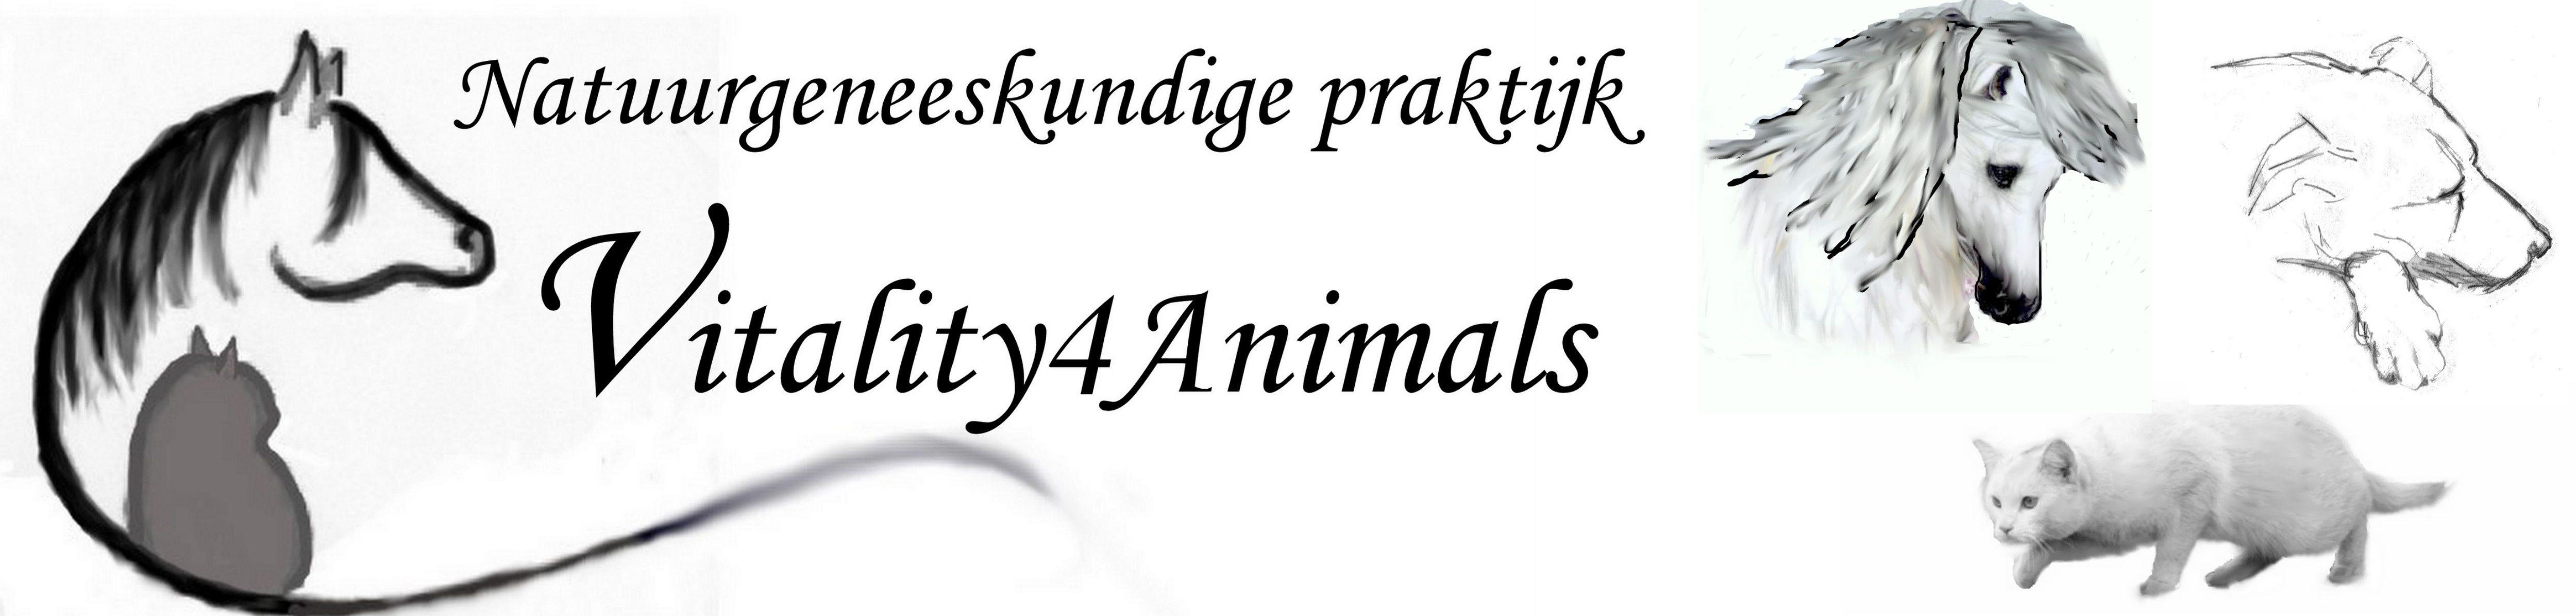 Natuurgeneeskundige praktijk Vitality4Animals